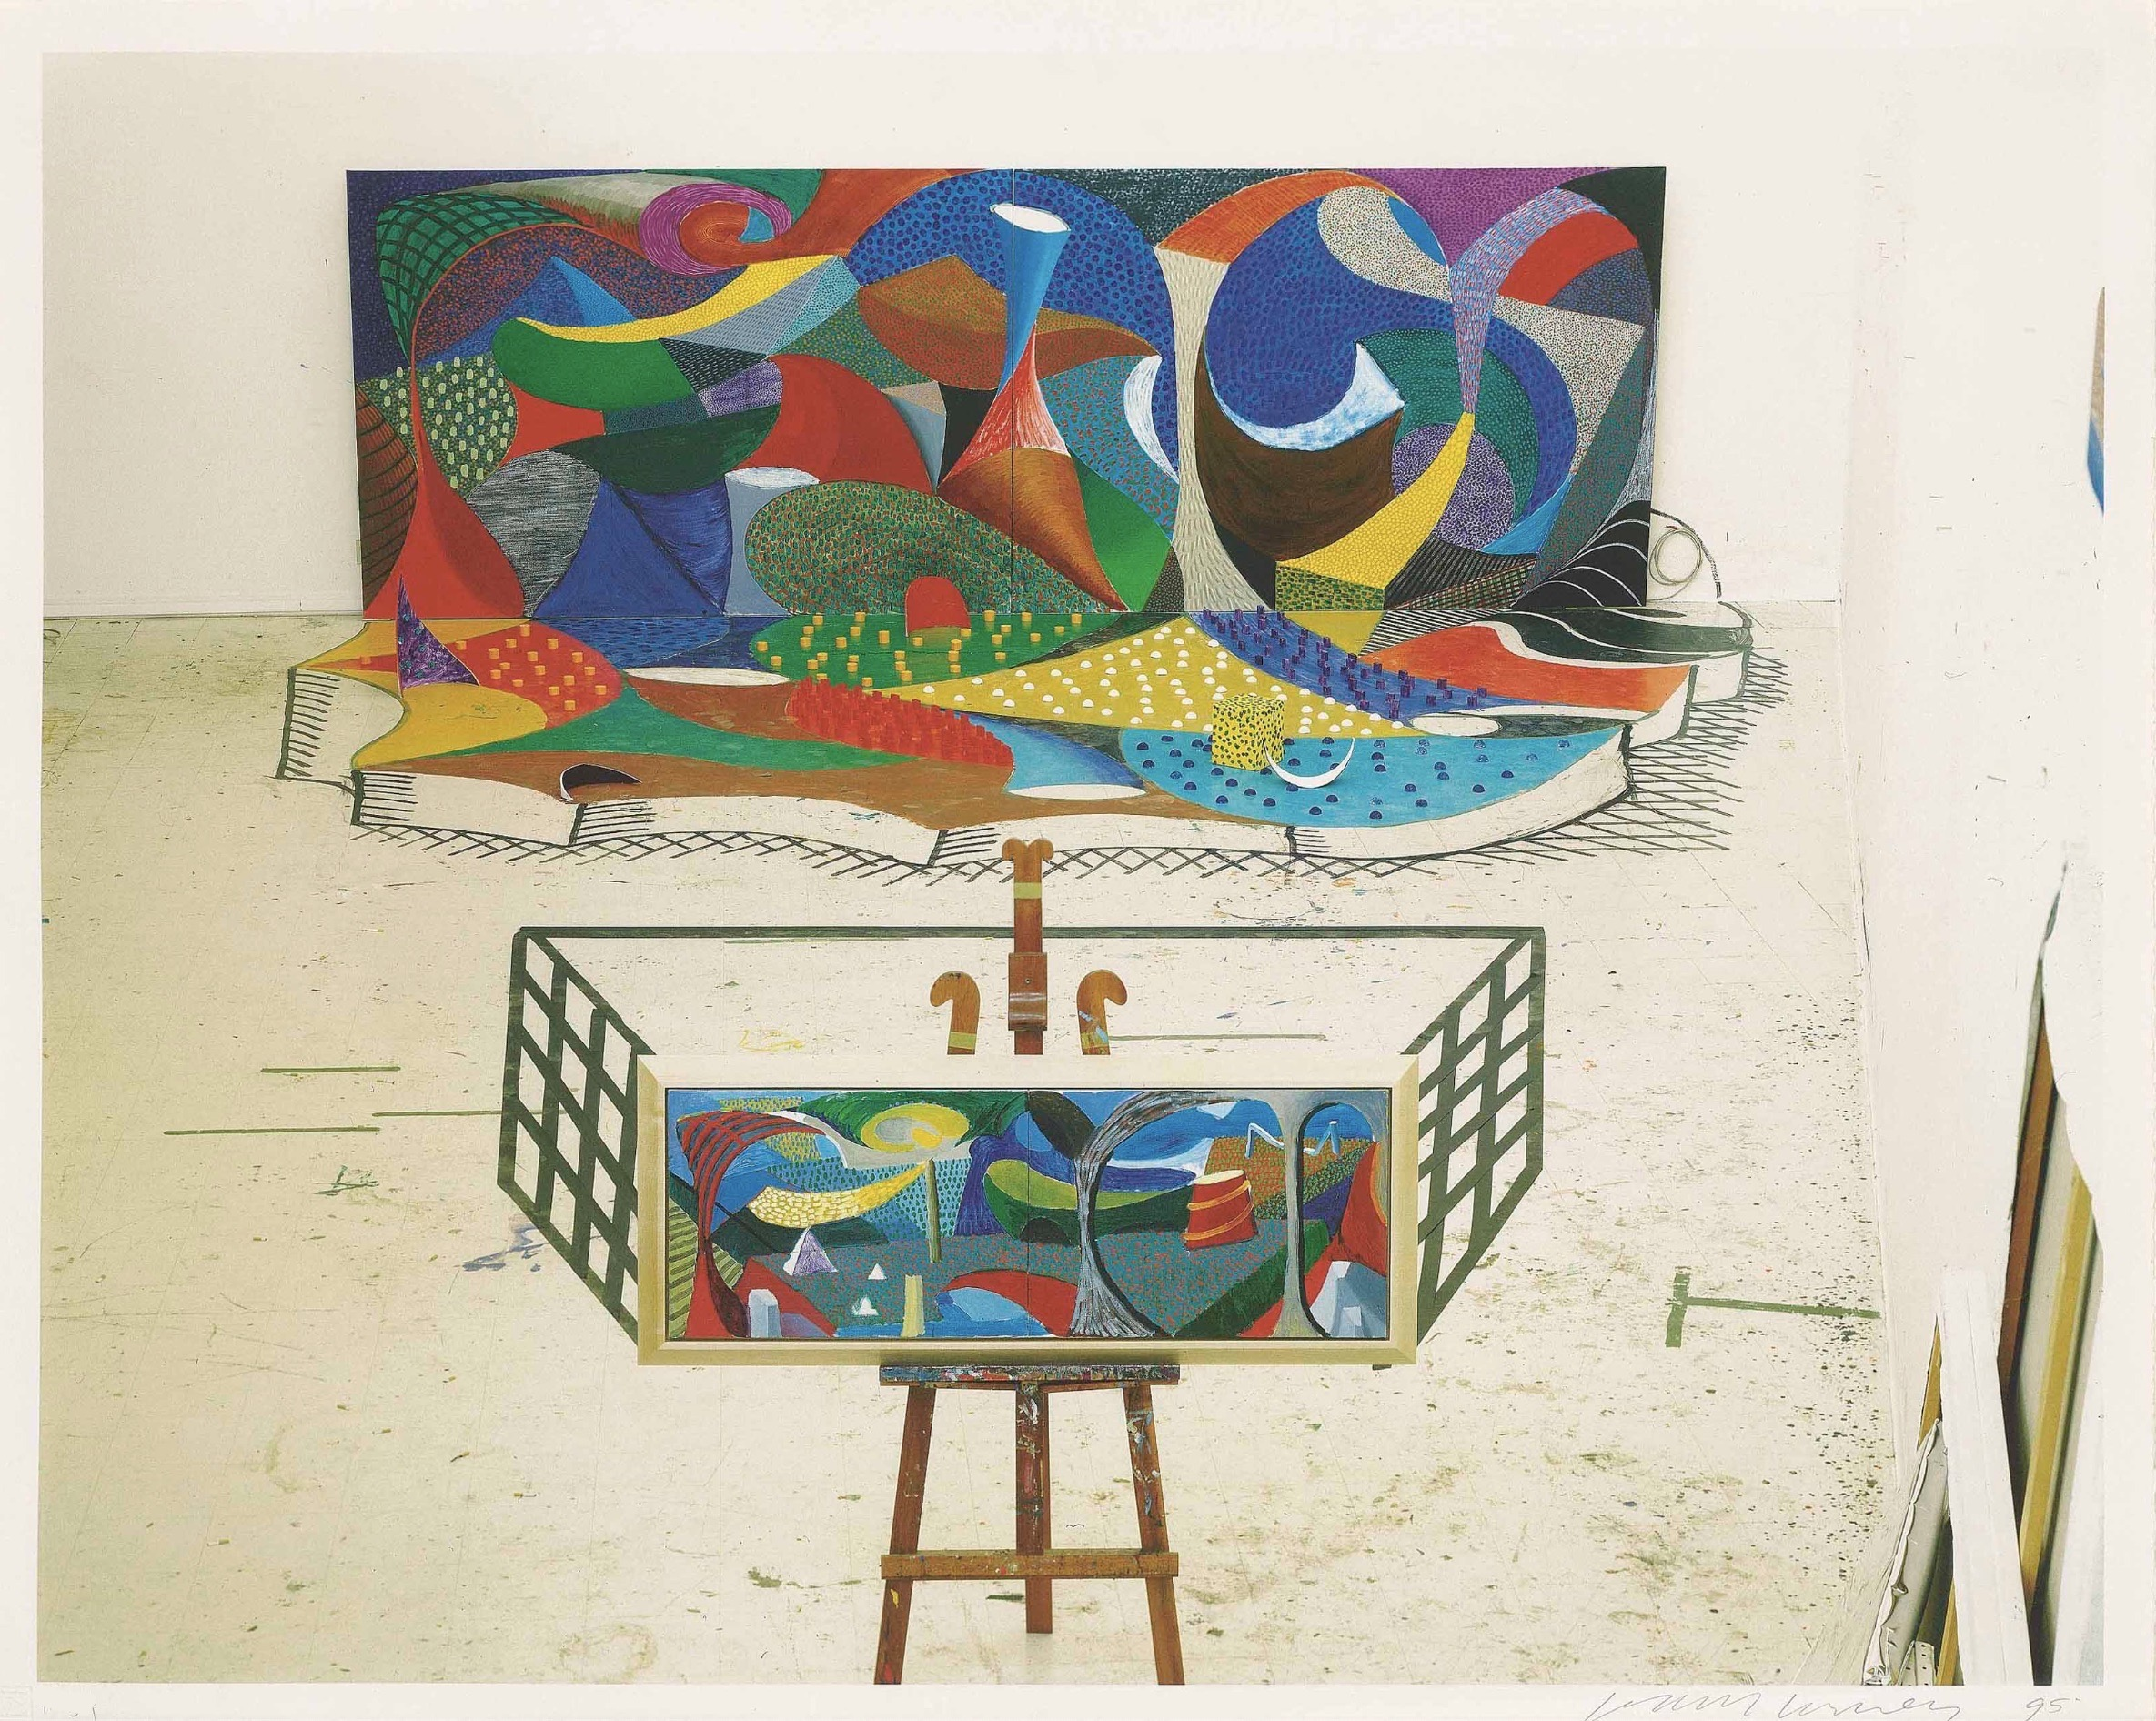 The studio, March 28th by David Hockney